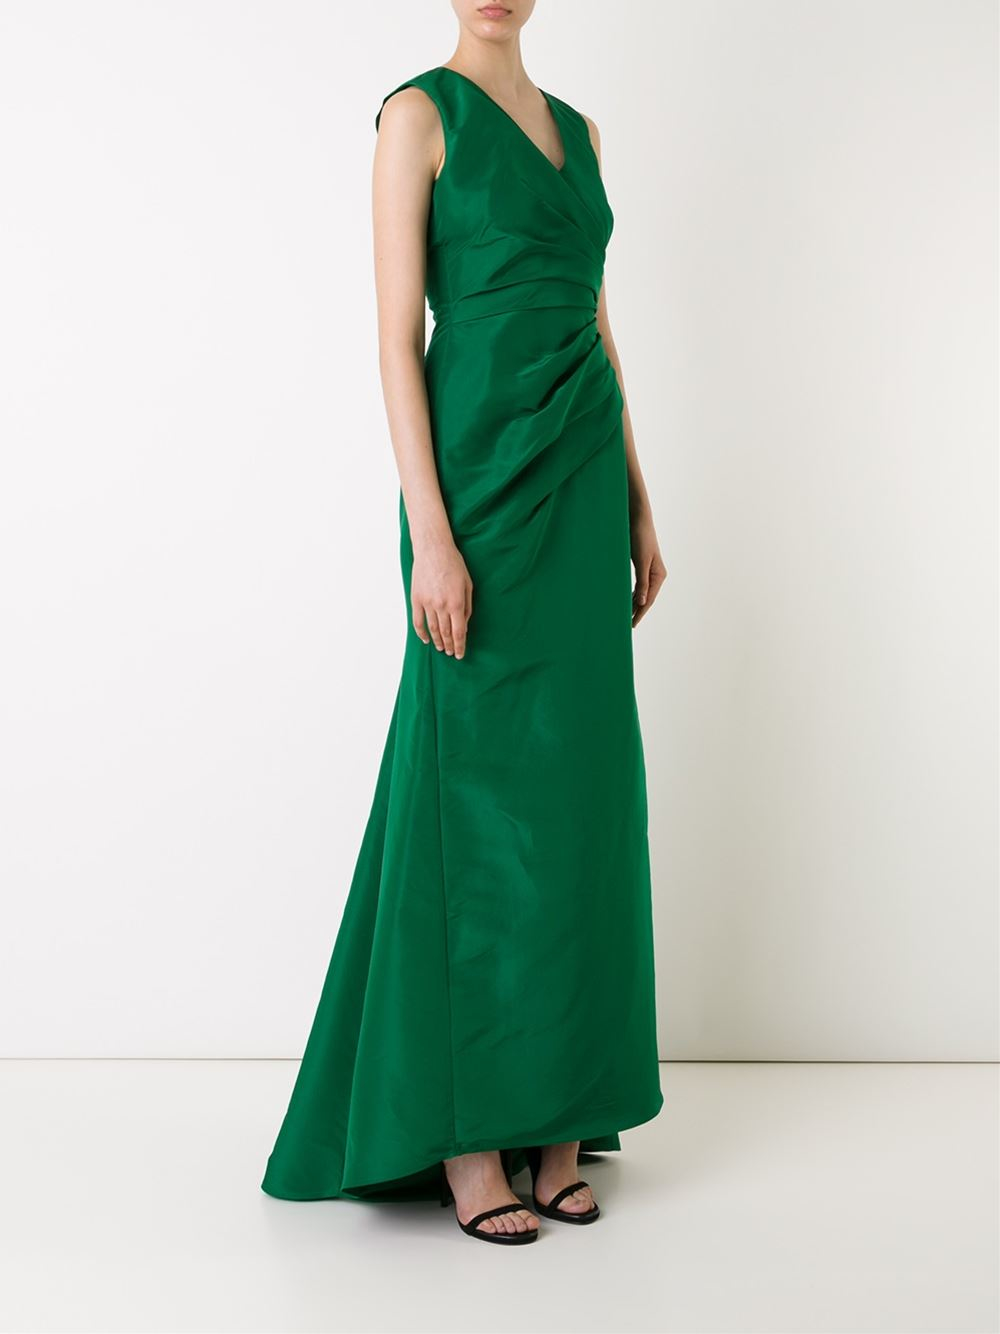 Carolina Herrera Draped Evening Dress In Green Lyst